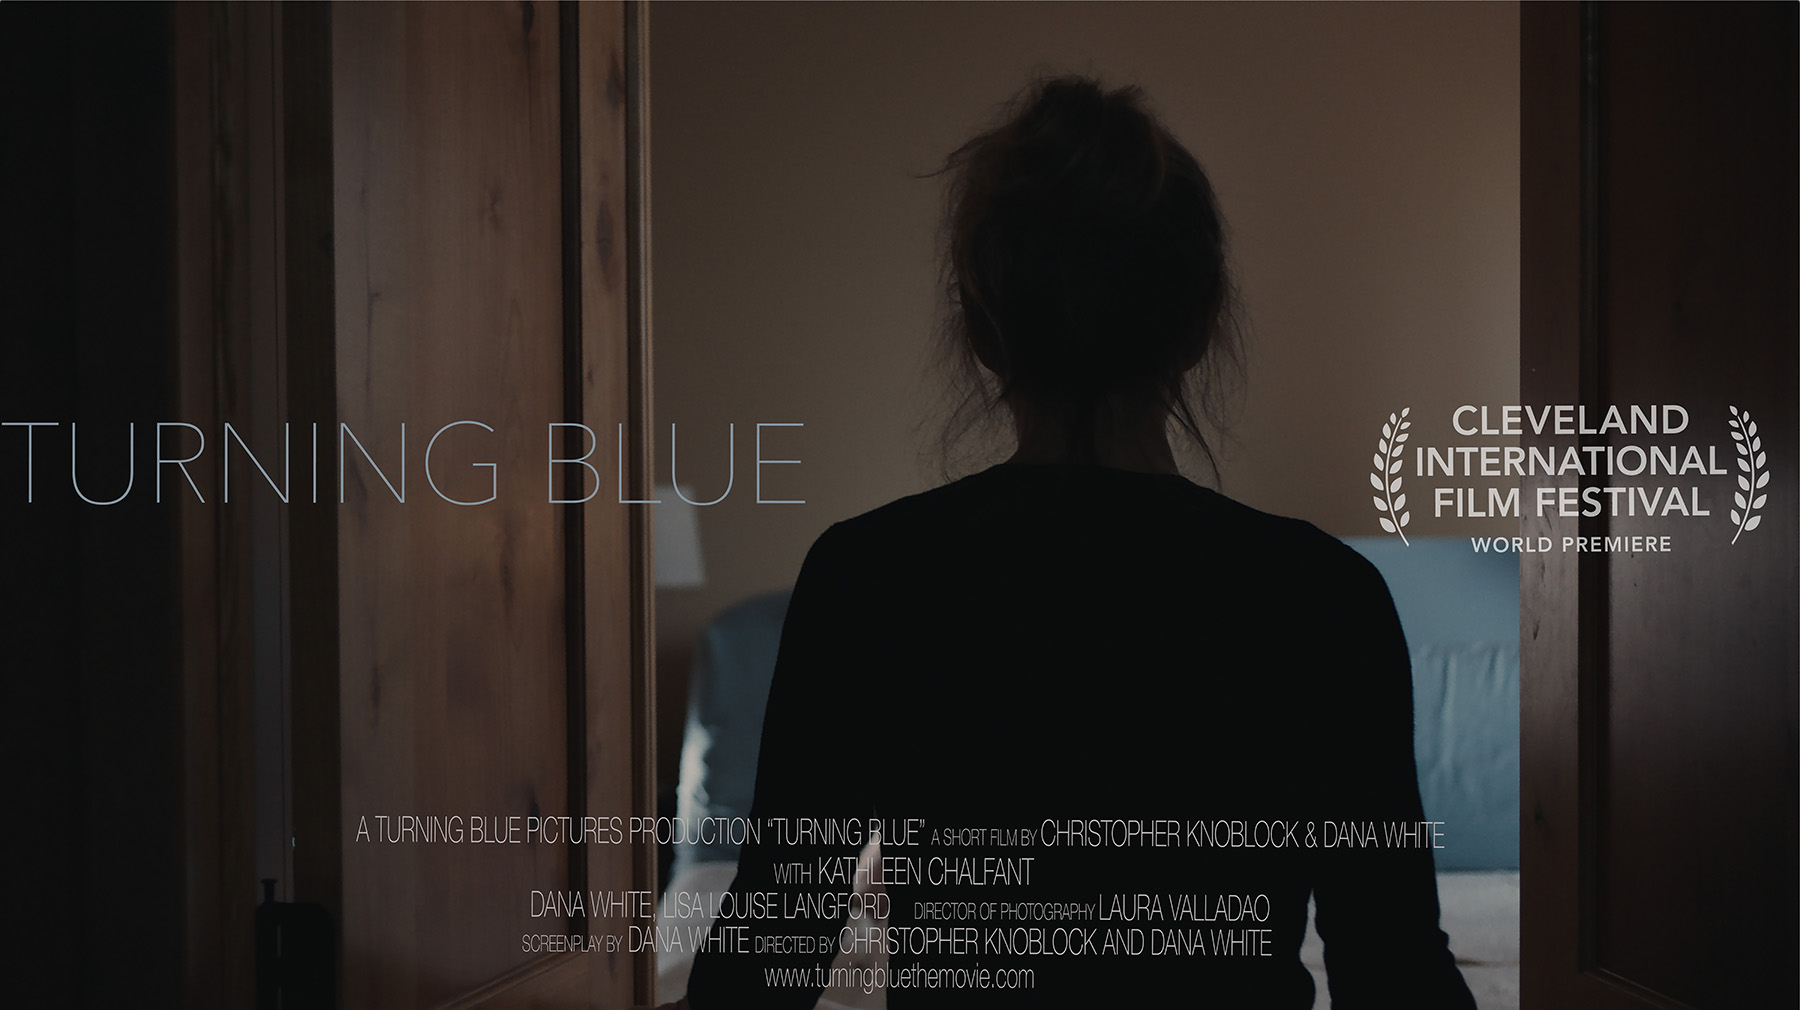 poster for Turning Blue film